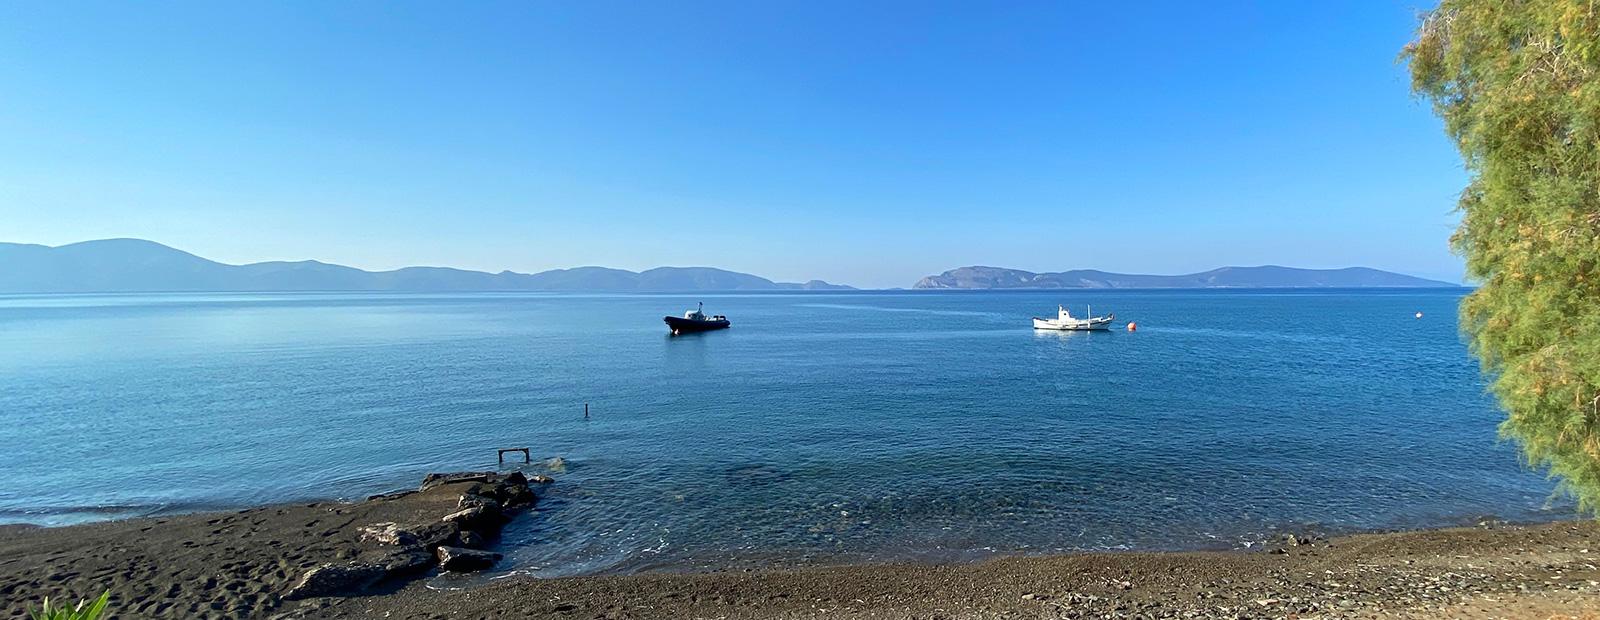 Exklusive Ferienvilla auf dem Peloponnes